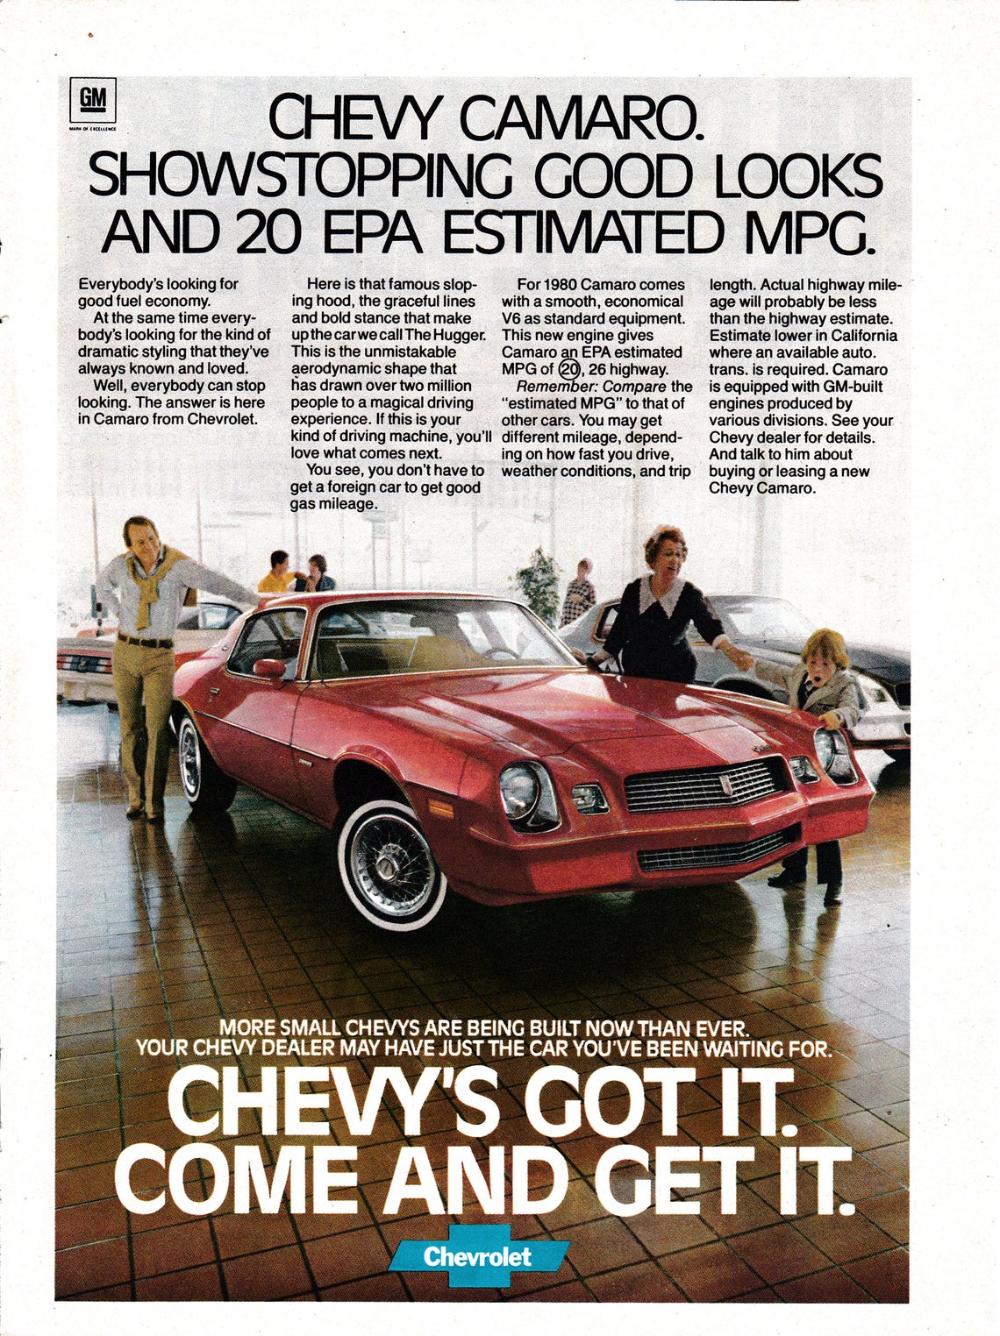 1980 Chevrolet Camaro Red 2 Door Showstopping Good Looks Original Magazine Ad